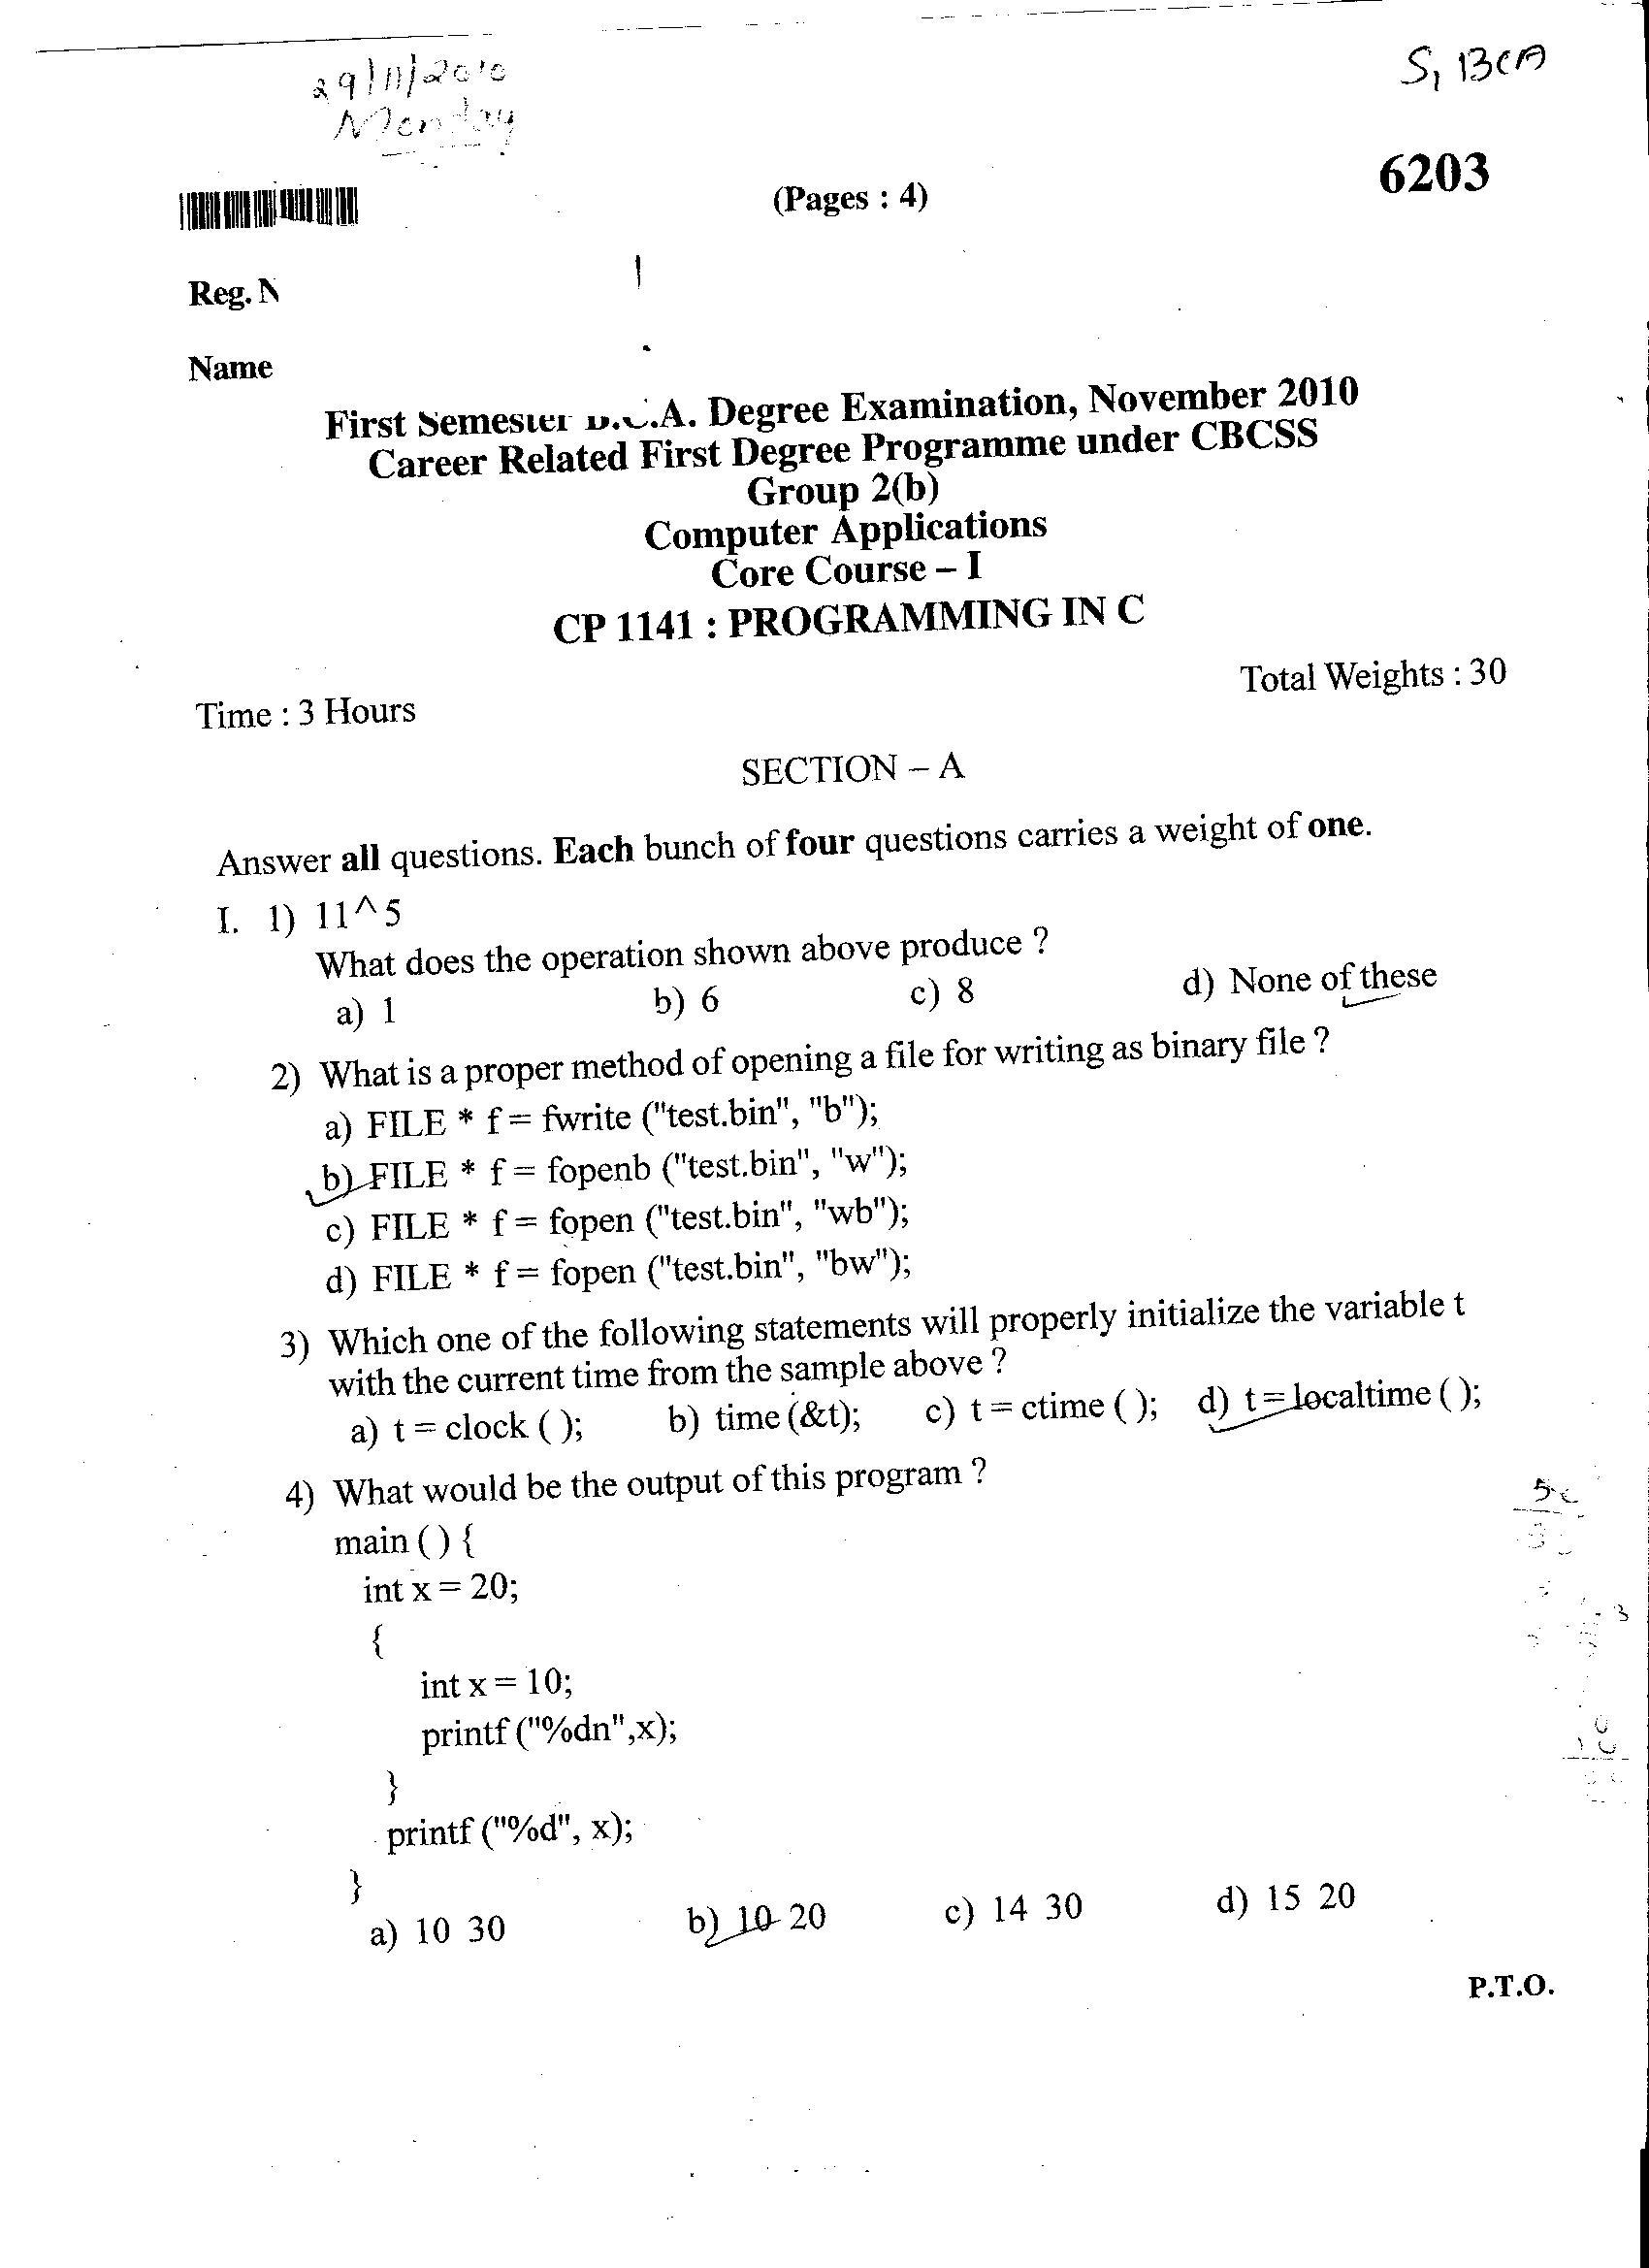 University of Kerala First Semester BCA Degree Examination, November